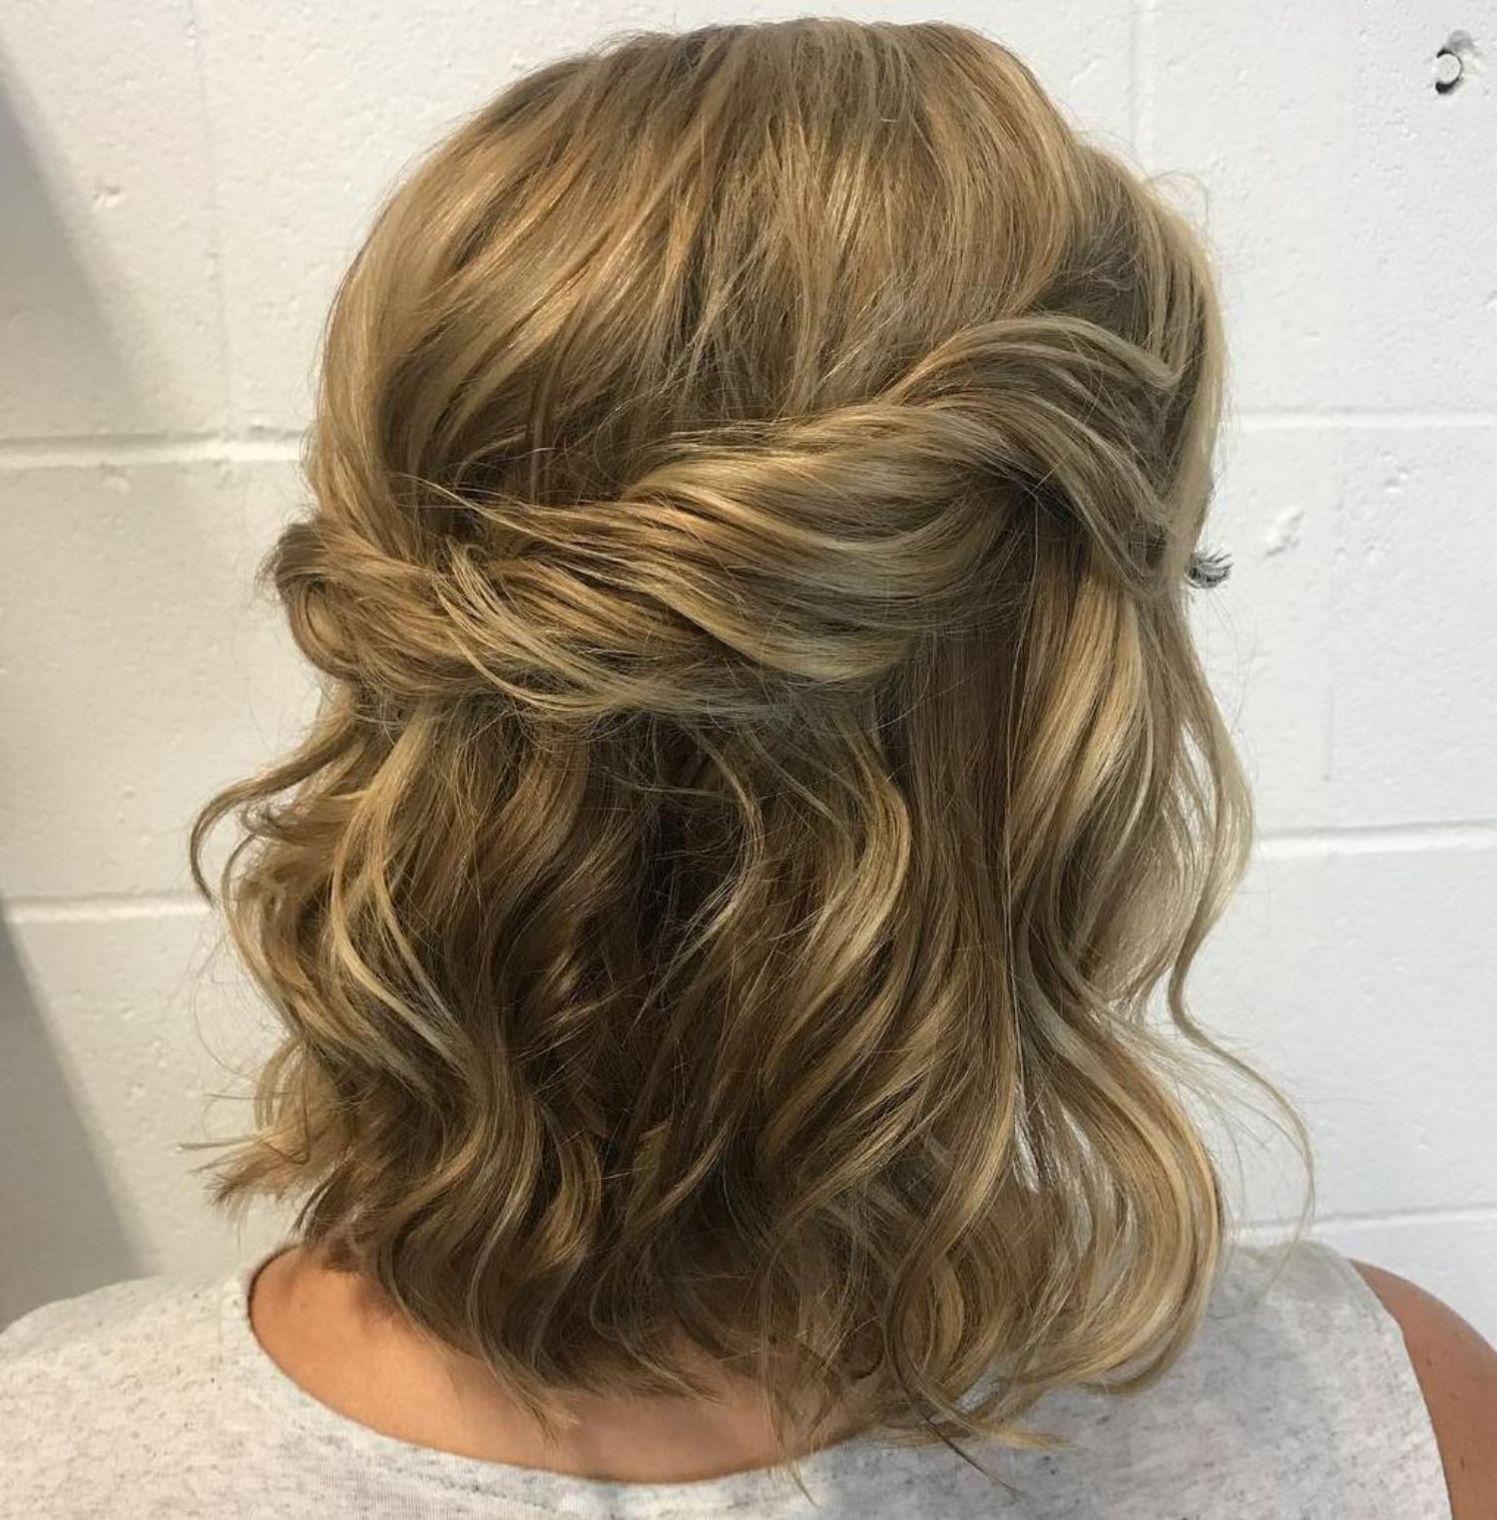 Wavy Half Up Half Down Hairstyle Medium Length Hair Styles Hair Styles Updos For Medium Length Hair